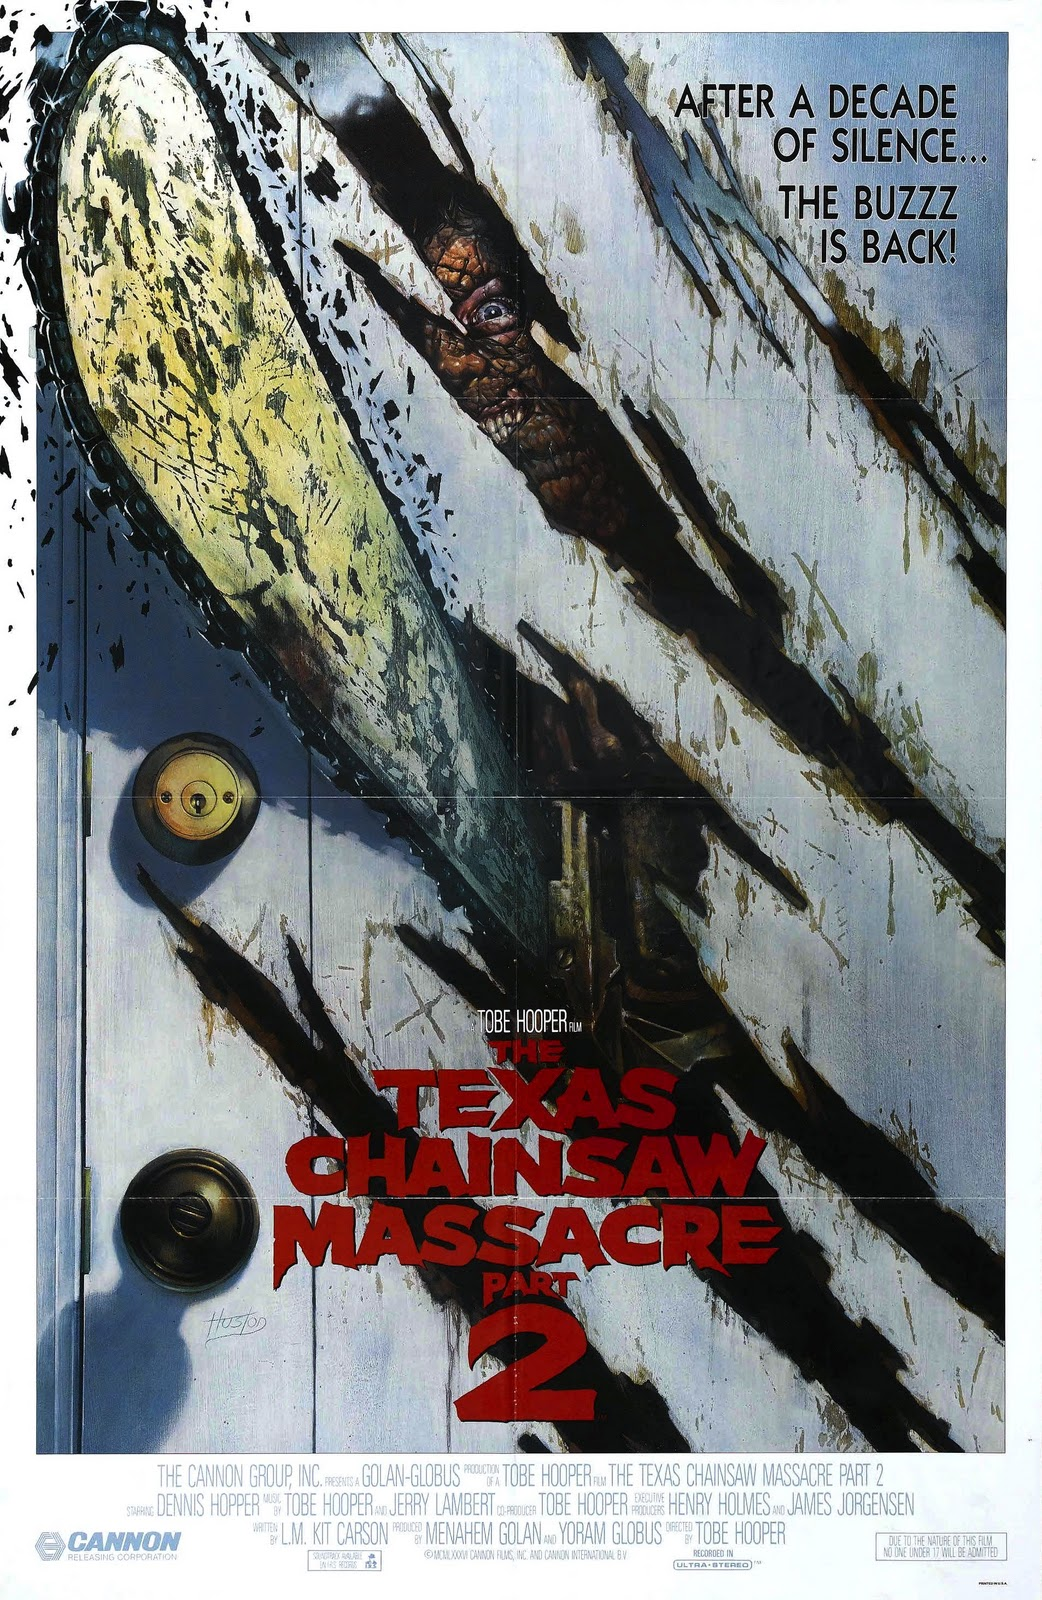 http://4.bp.blogspot.com/_a_kfggseBks/TUcBtC2B_dI/AAAAAAAABJc/cpSbJI11lMo/s1600/texas_chainsaw_massacre_2_poster_01.jpg